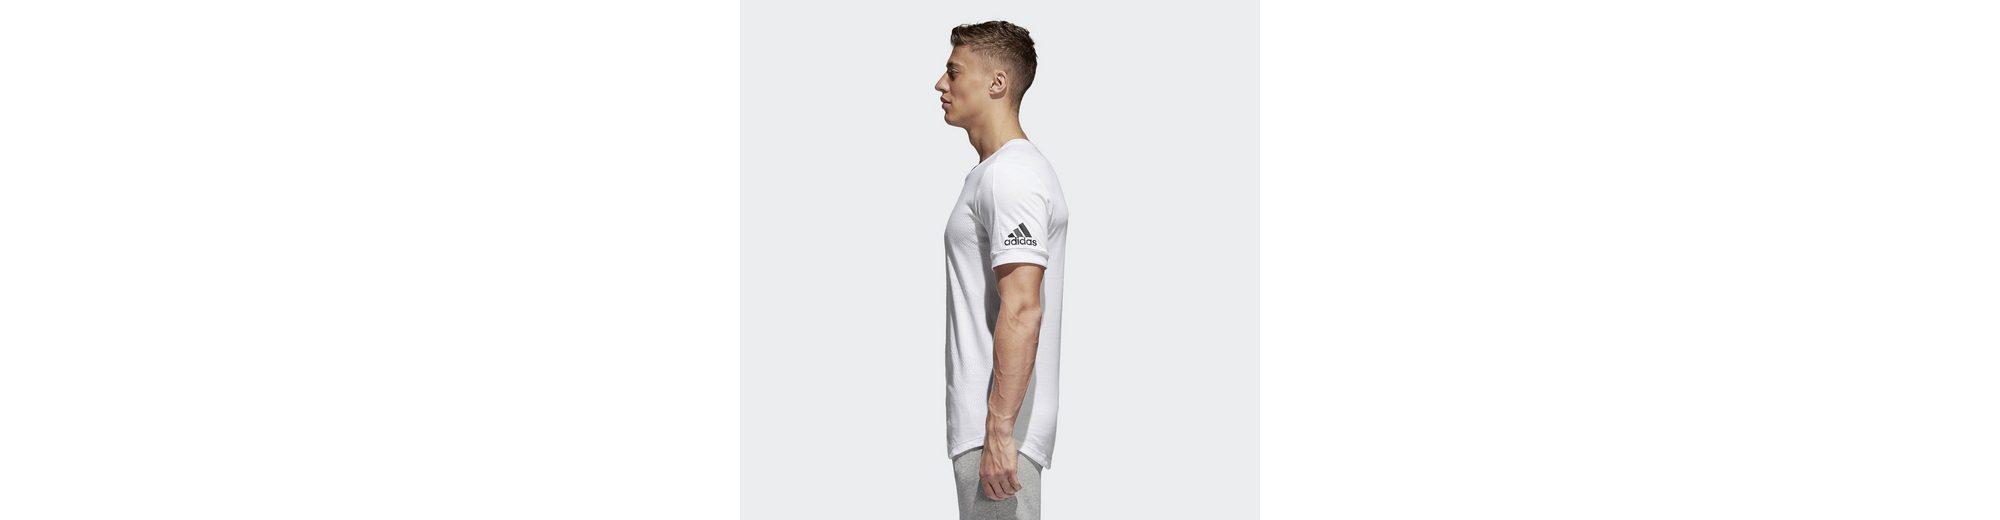 Exklusiv adidas Performance T-Shirt ID Chevron T-Shirt Auslass Bester Verkauf Für Schön KH7jJzpS